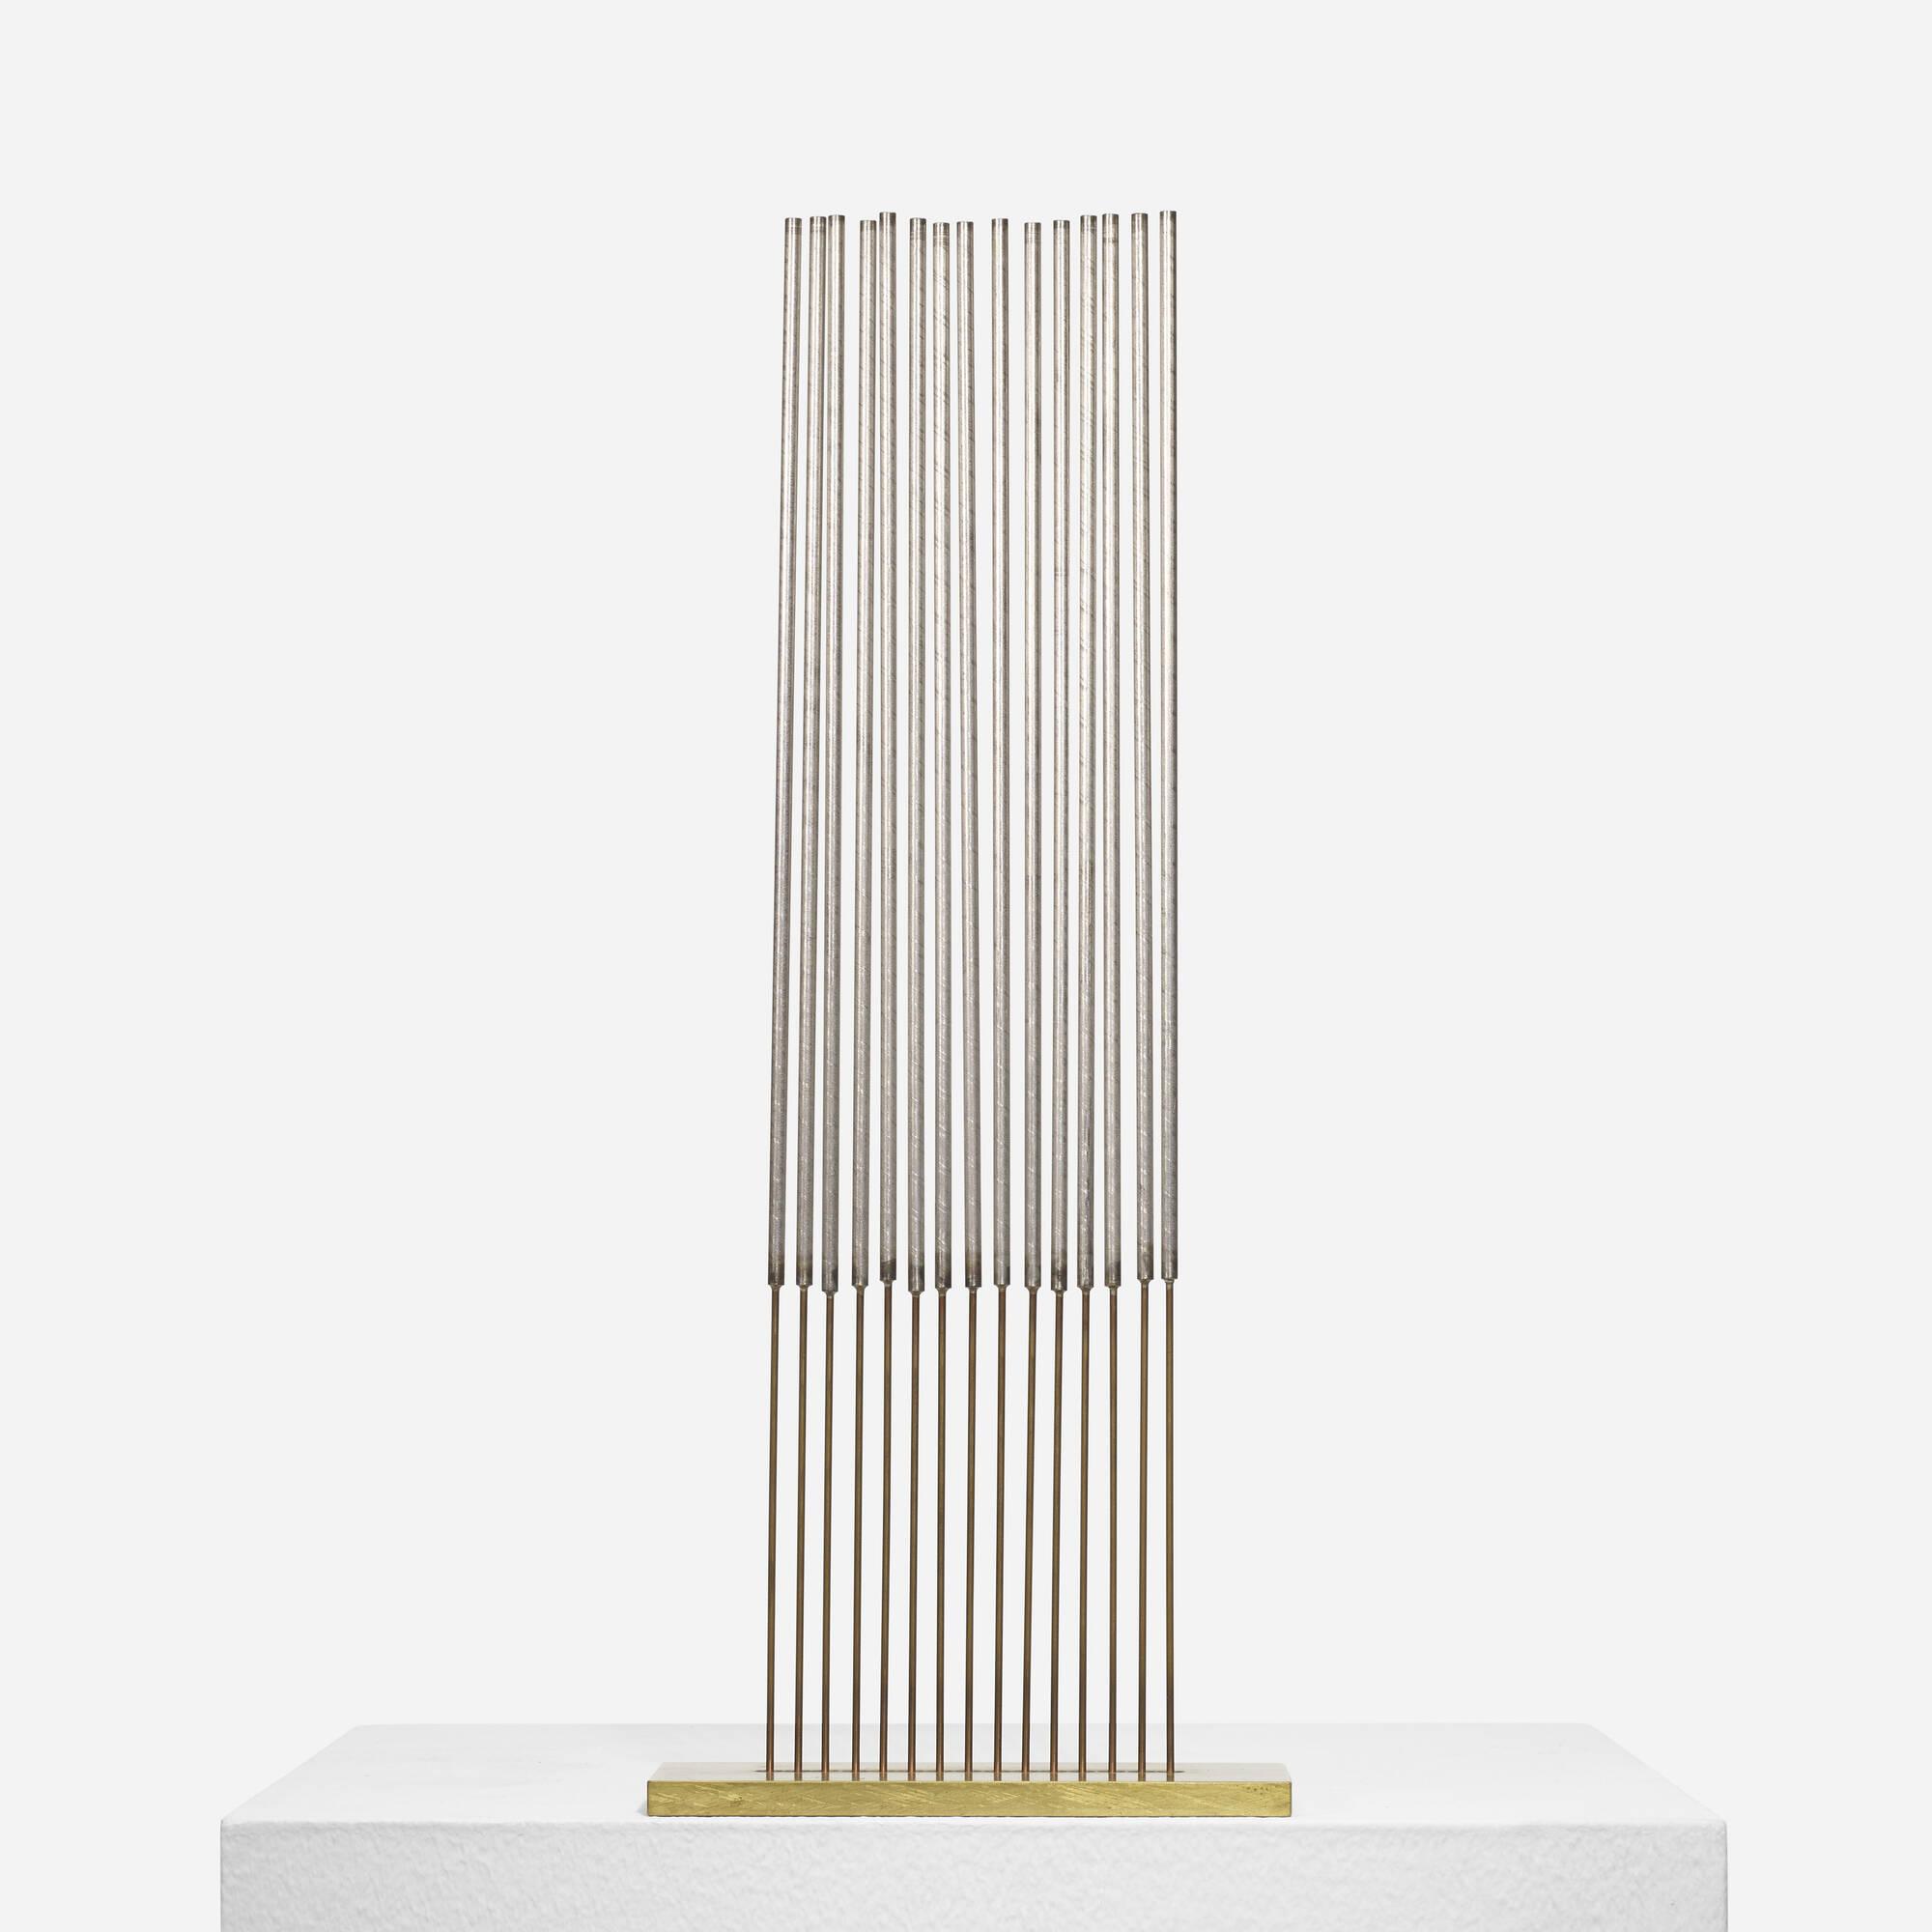 136: Harry Bertoia / Untitled (Sonambient) (1 of 3)